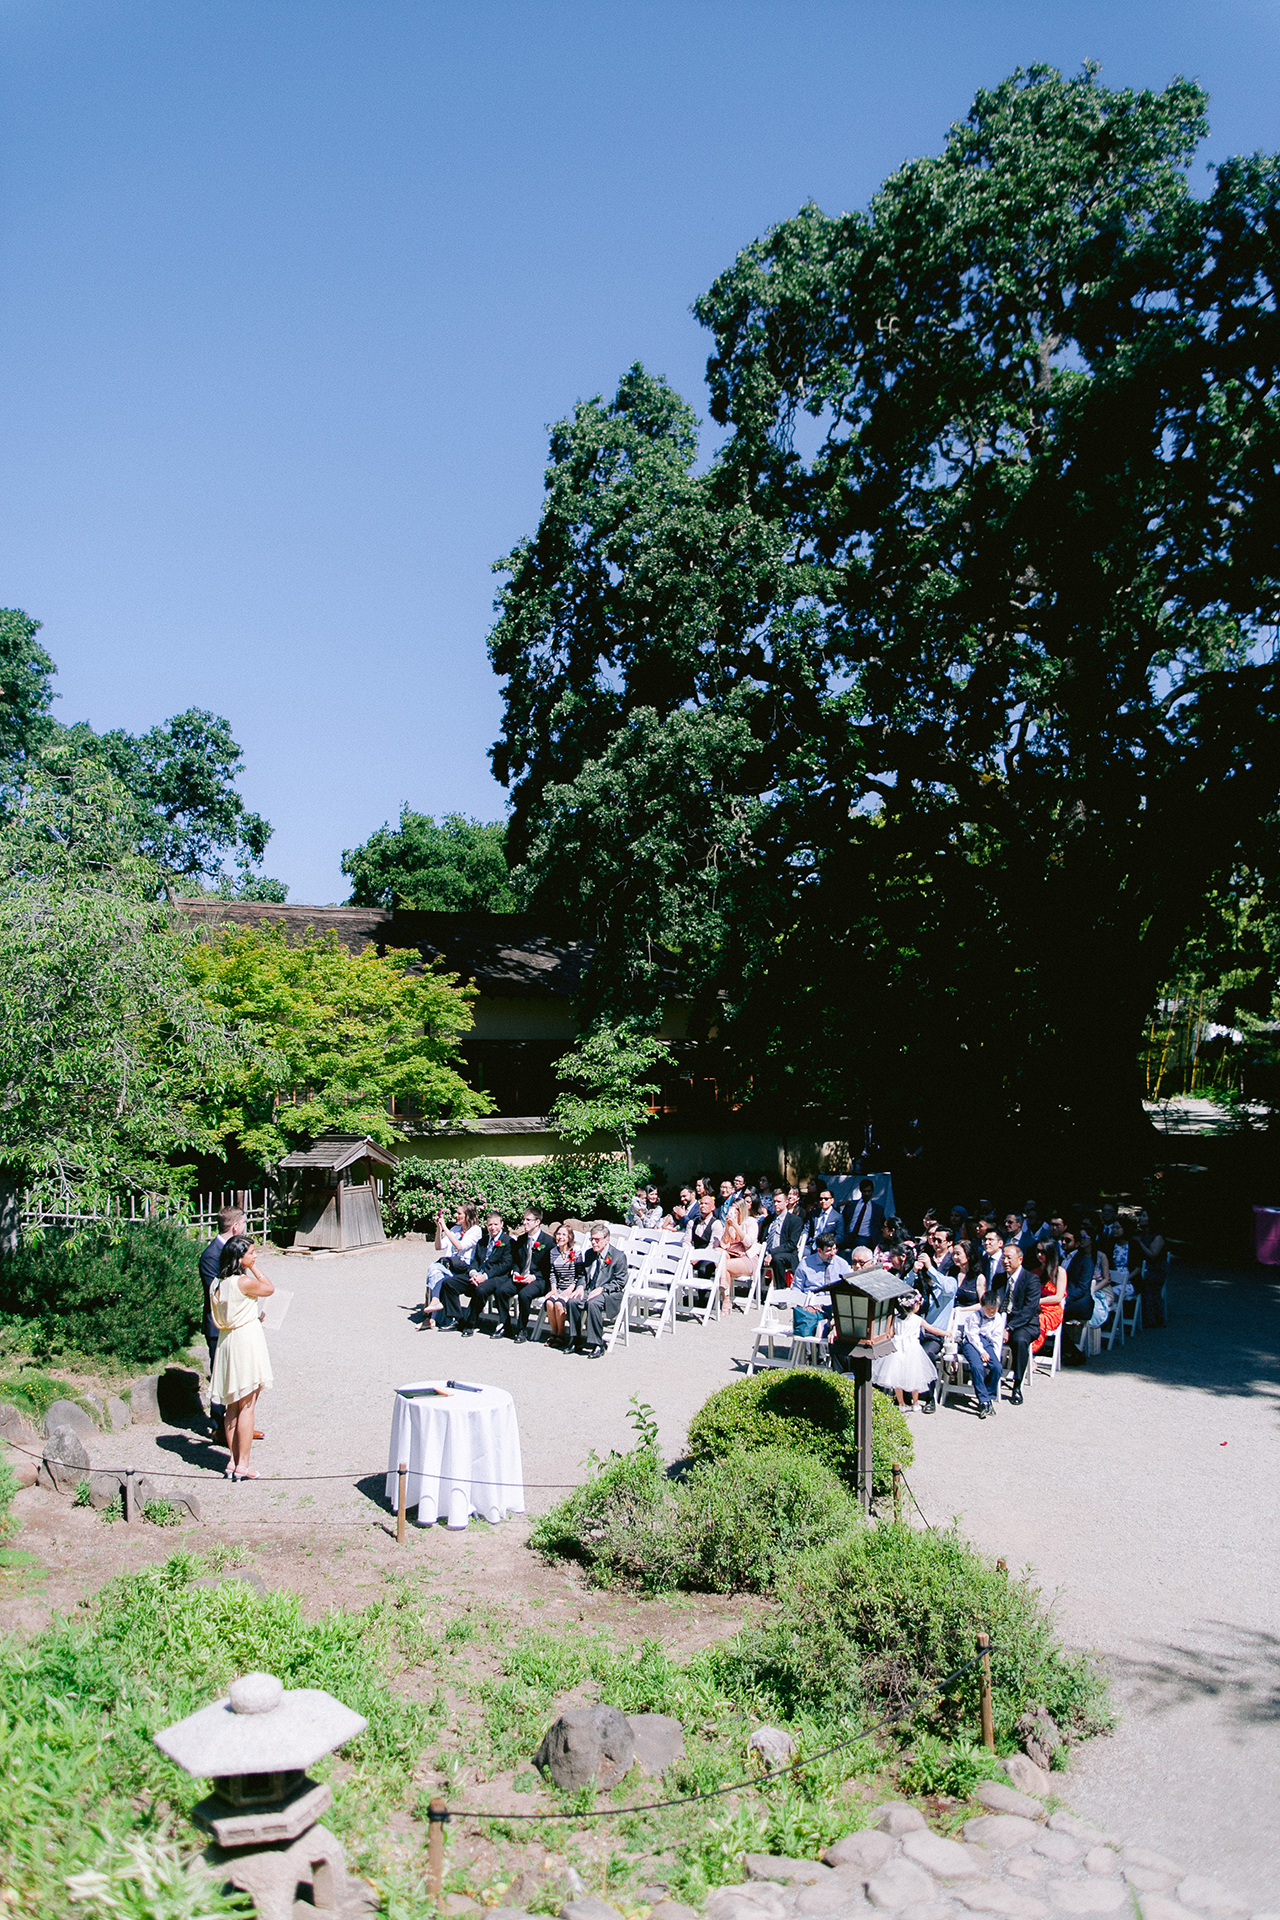 Hakone_Estate_and_Gardens_Wedding_021.jpg